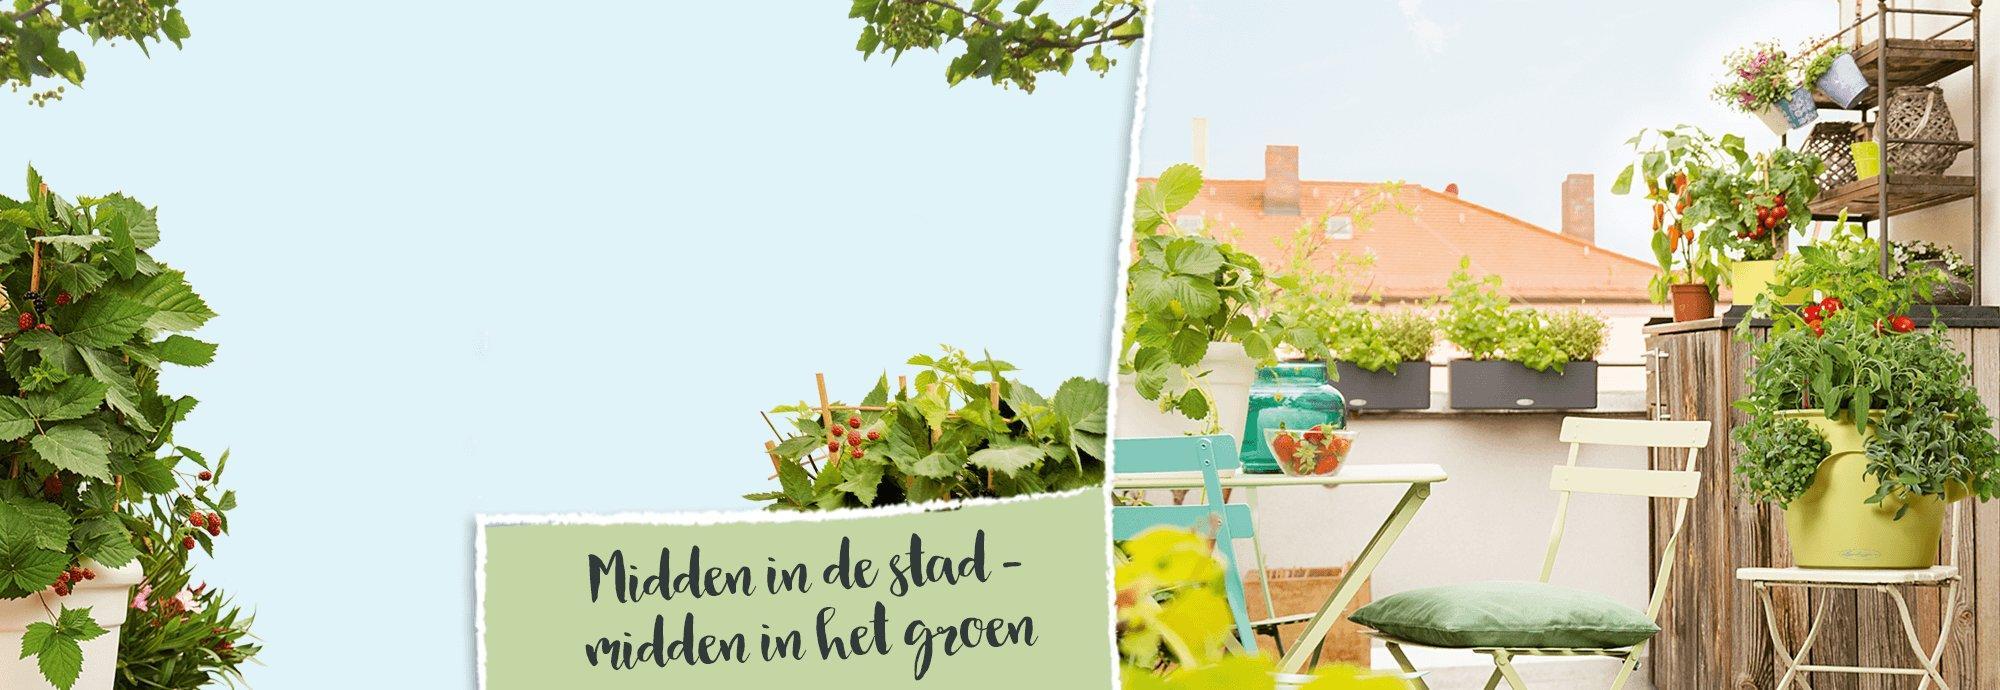 hero_banner_urban_gardening_nl